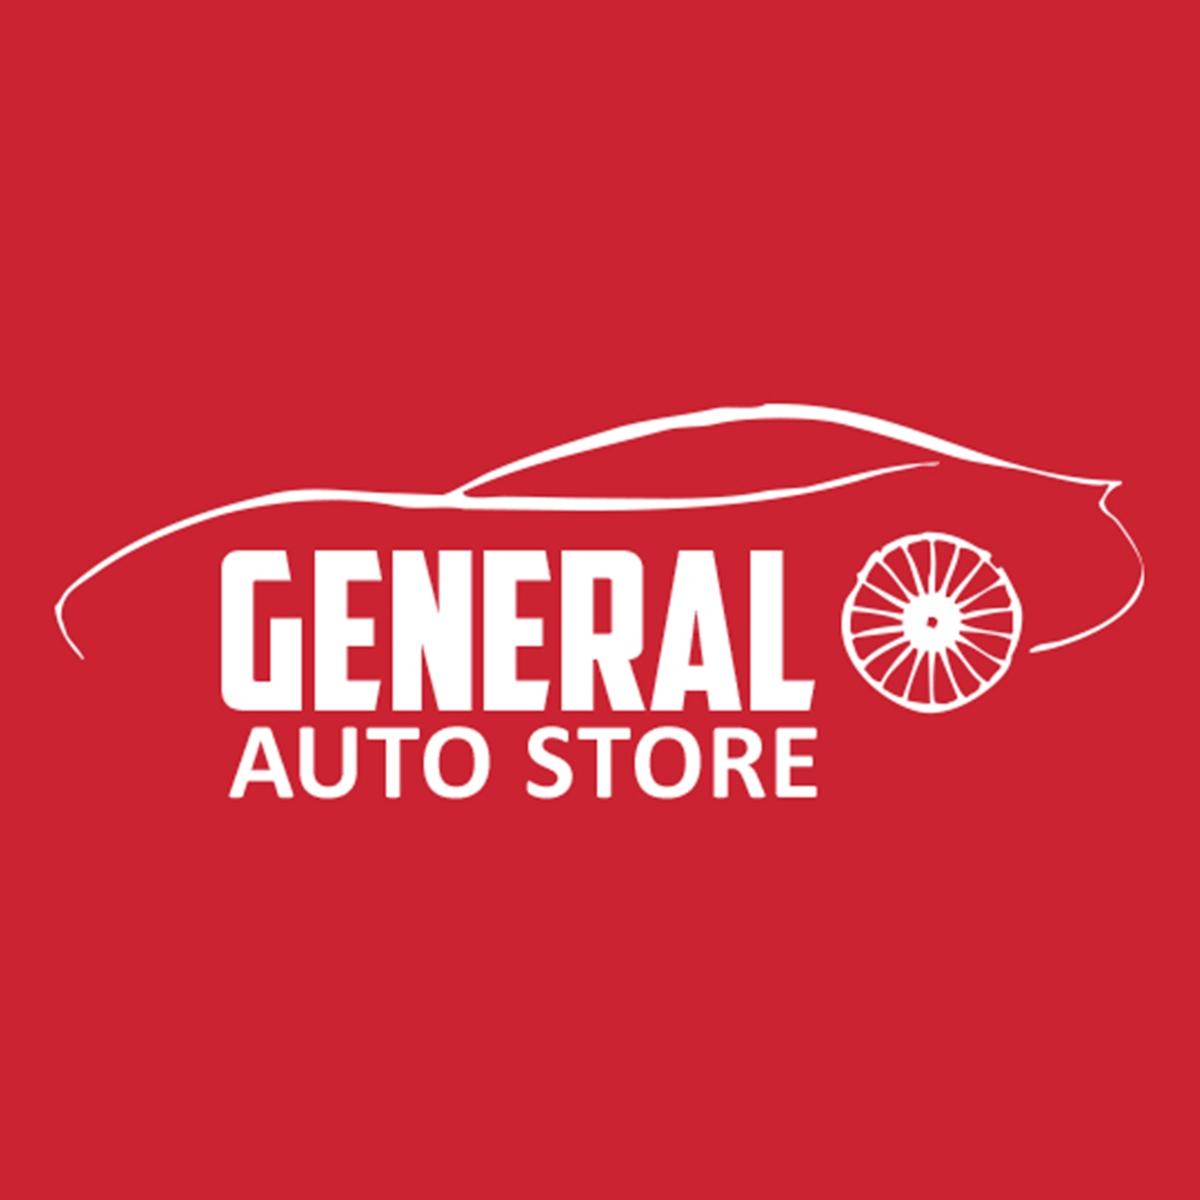 General Auto Store | Pakistans Largest Car Accessories Hub